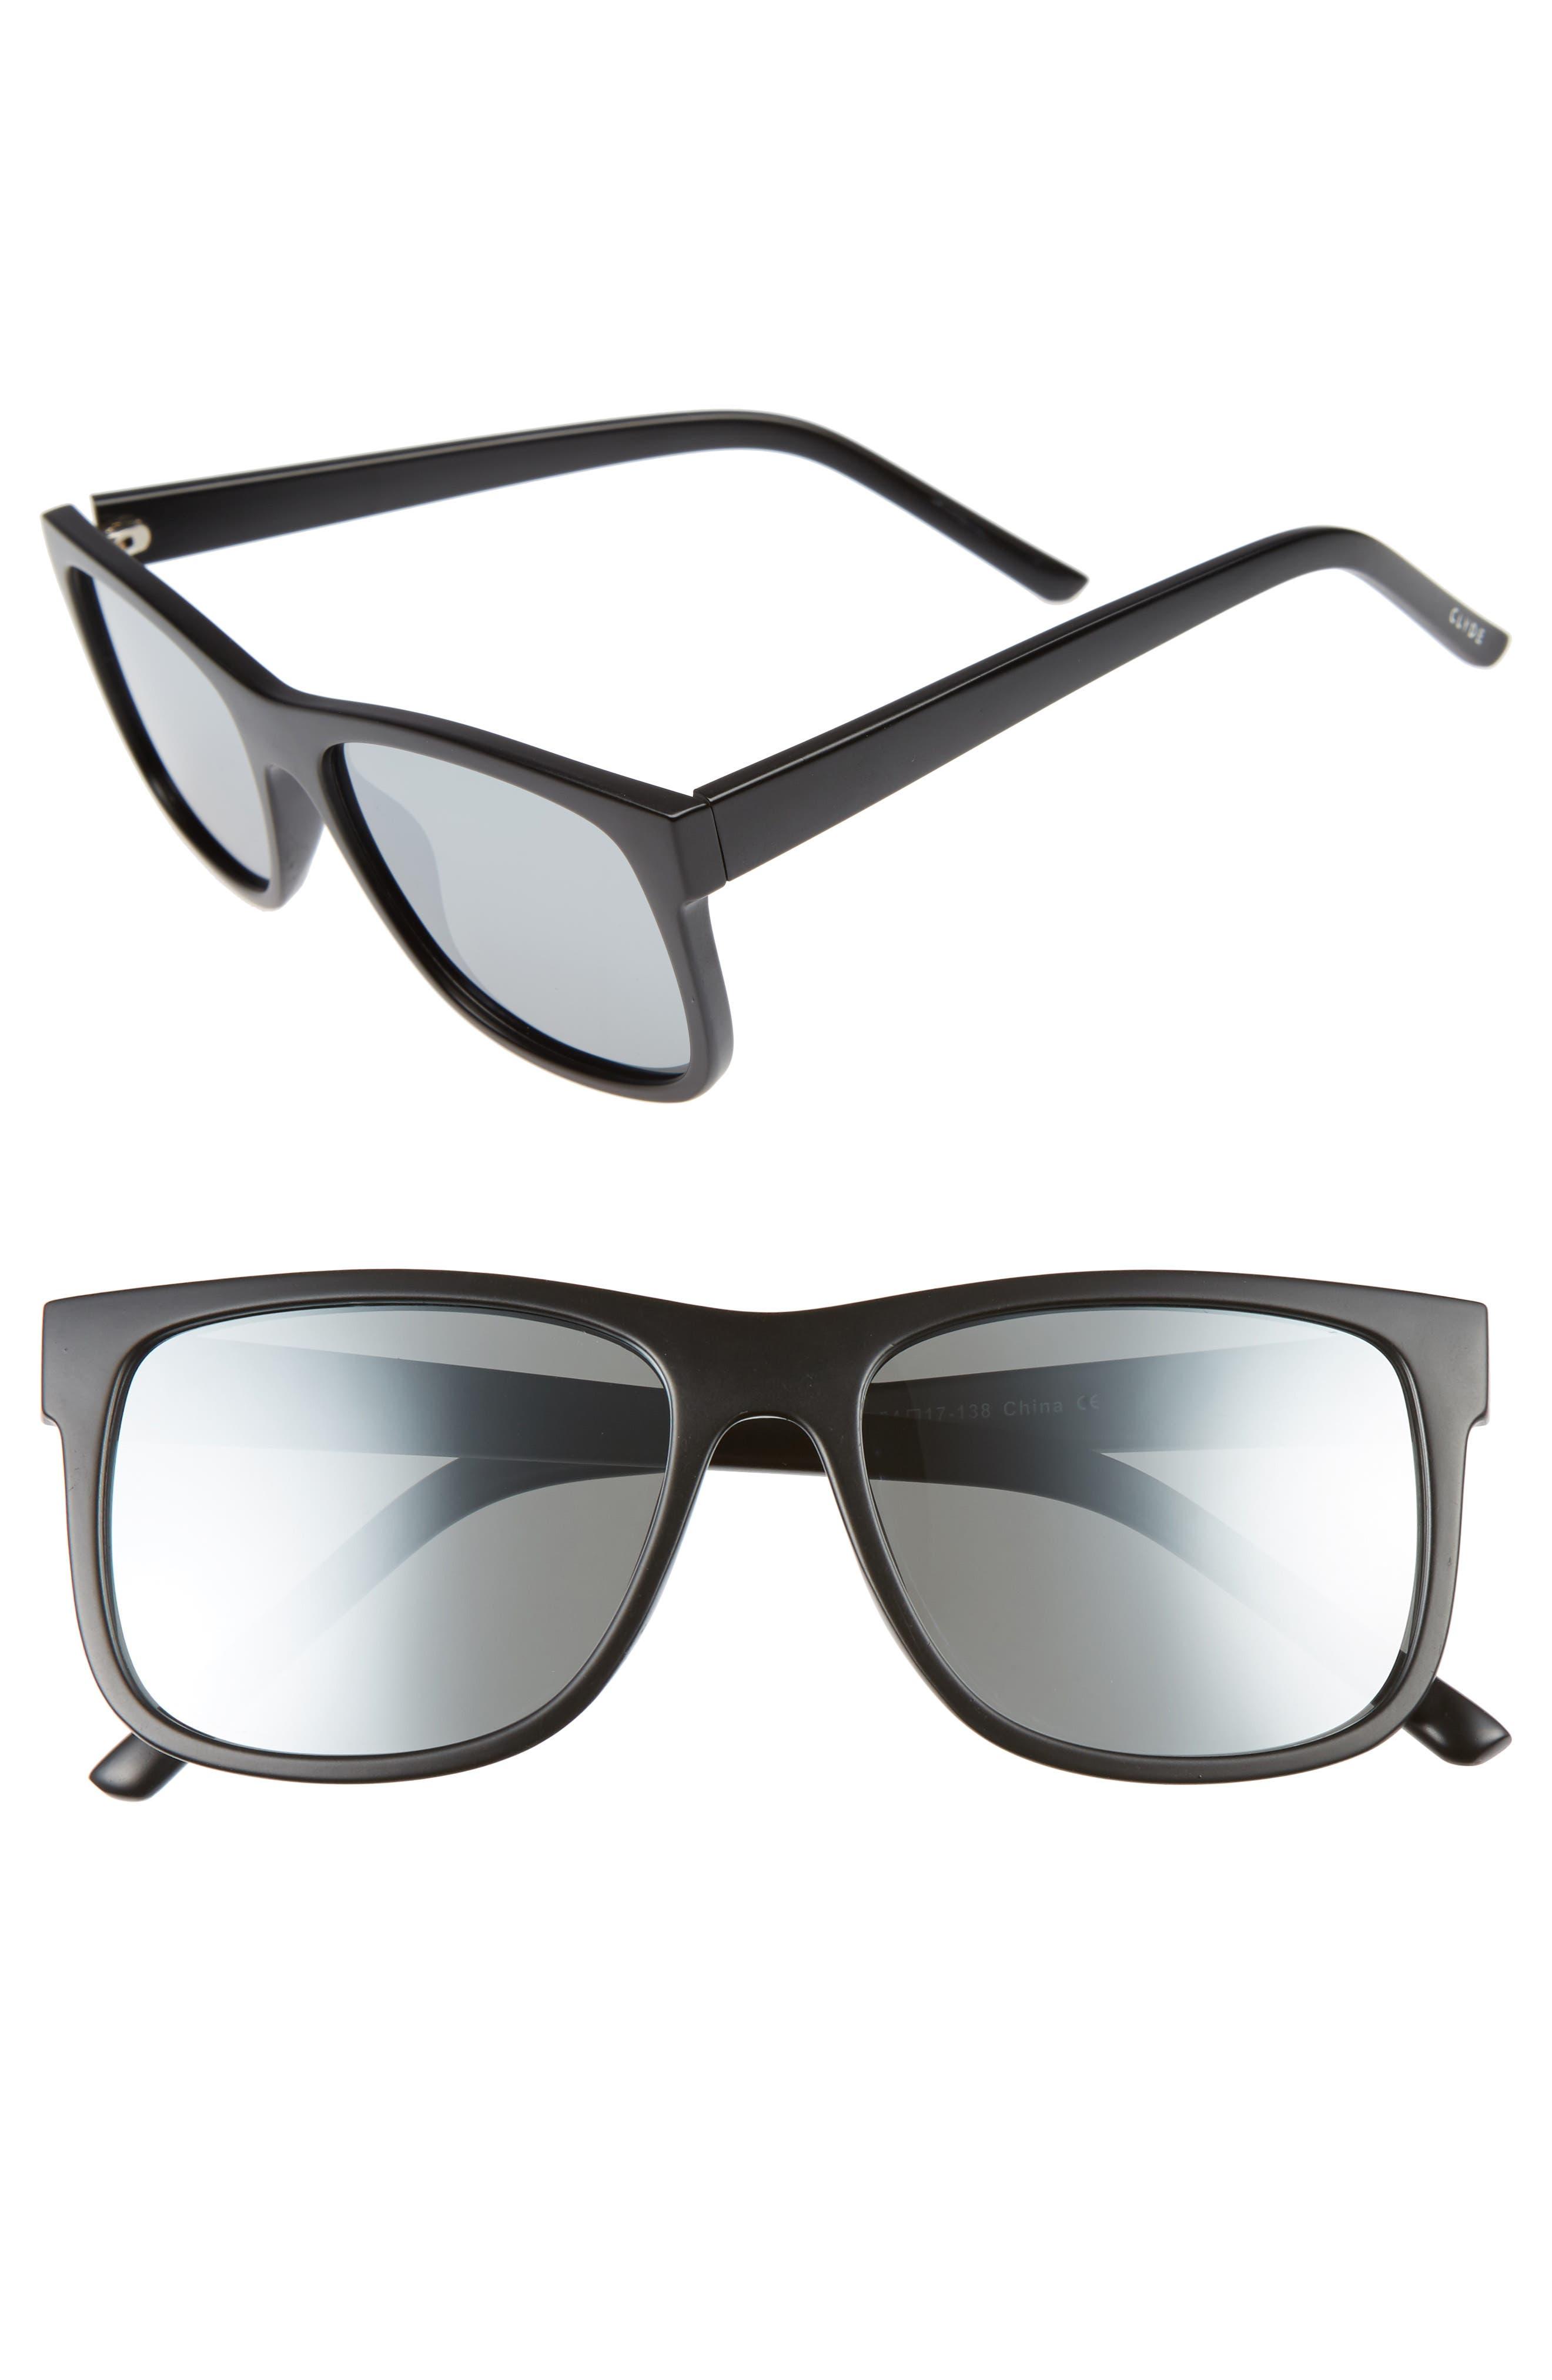 Main 54mm Polarized Sunglasses,                             Main thumbnail 1, color,                             001